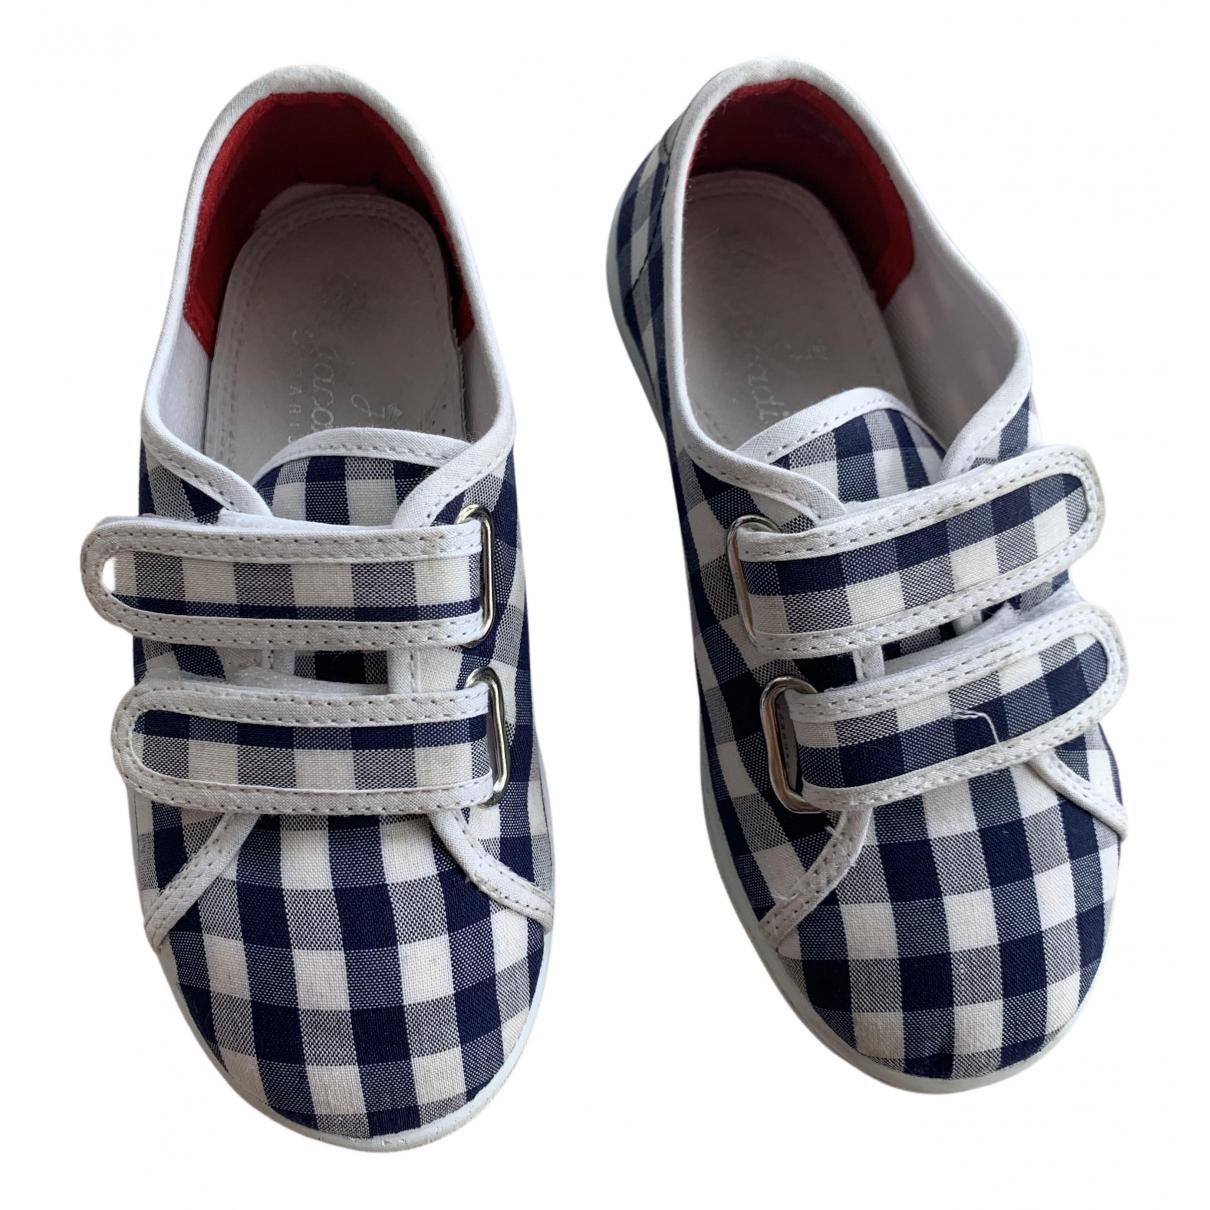 Jacadi N Navy Cloth Flats for Kids 27 FR